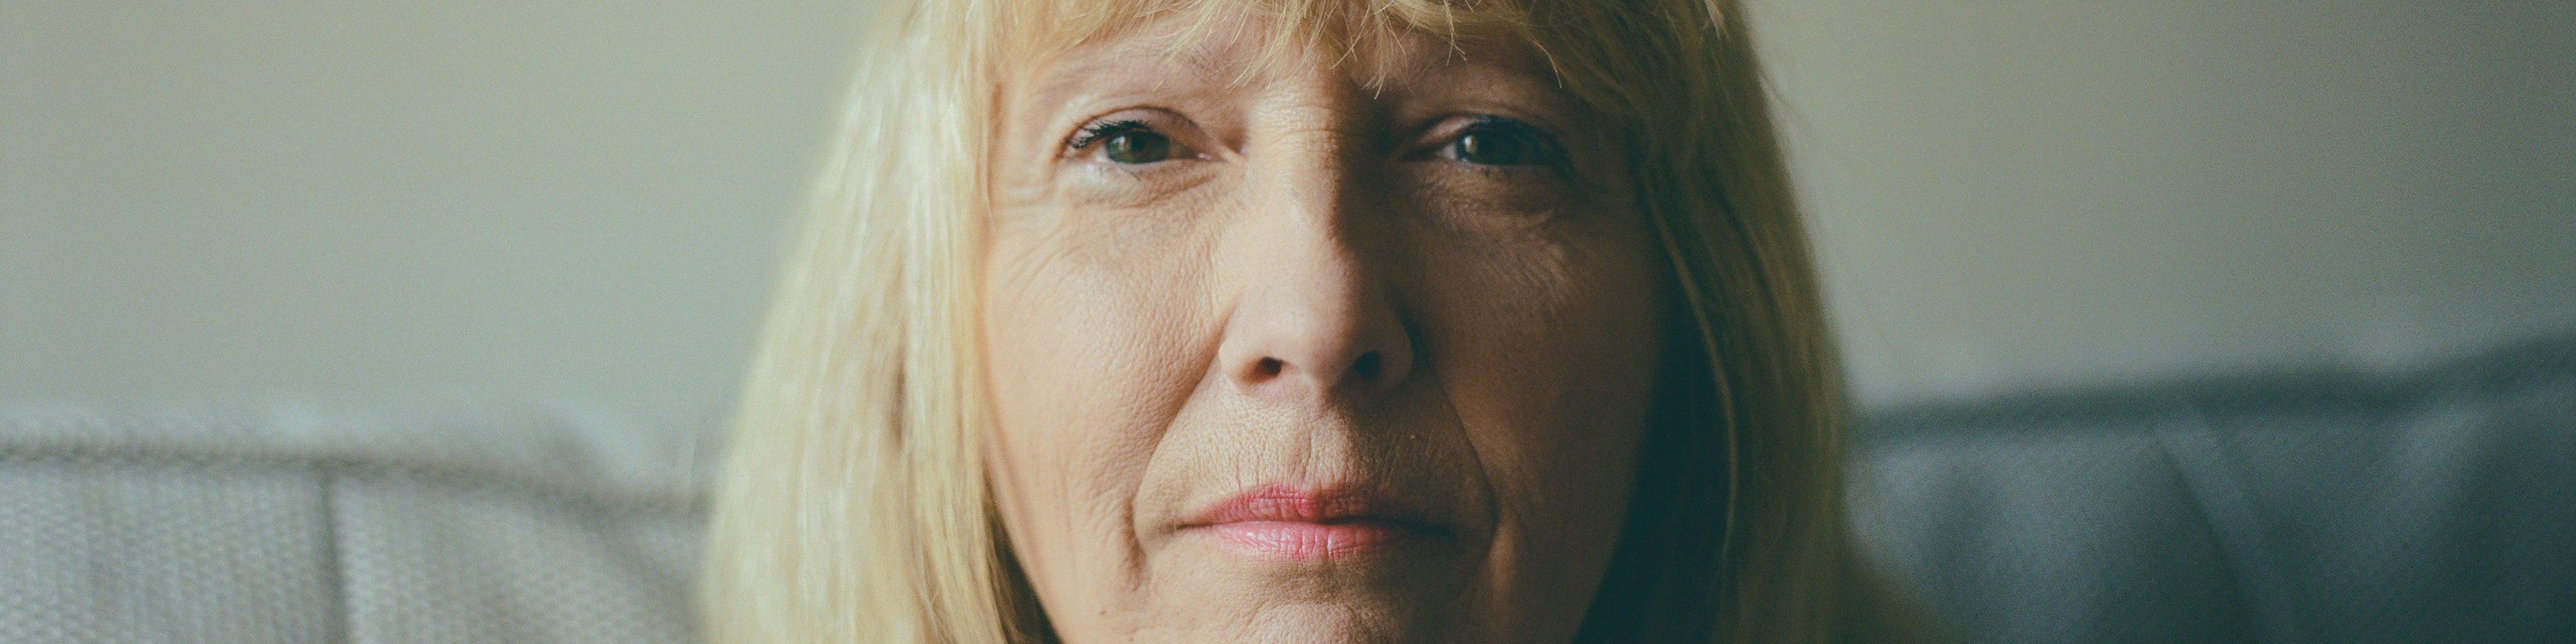 Dementia and us - Still - BBC - Copyright Suzie Howell